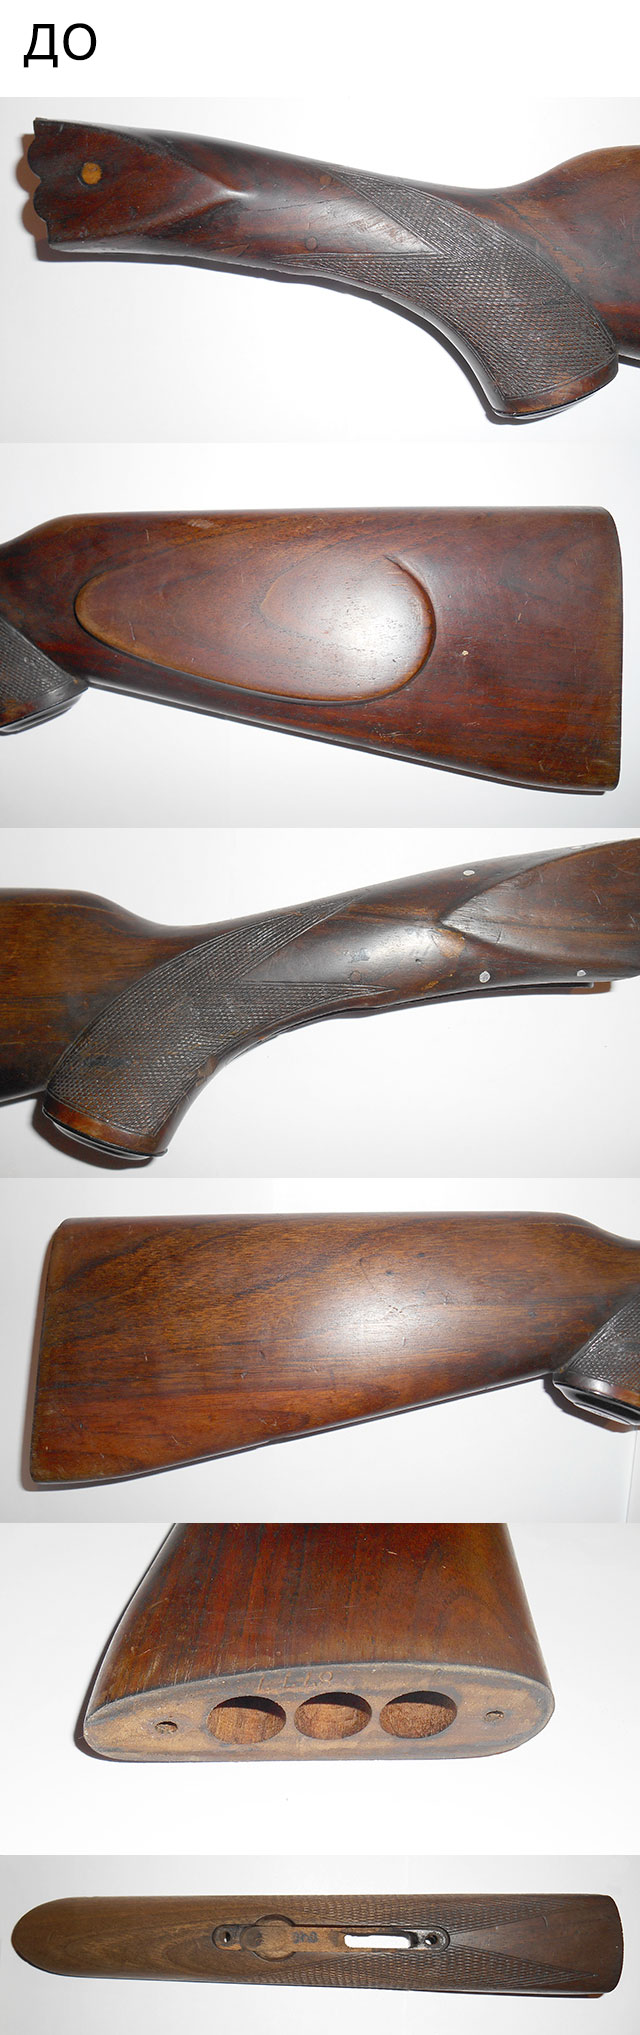 Приклад и цевье ружья Simson до реставрации